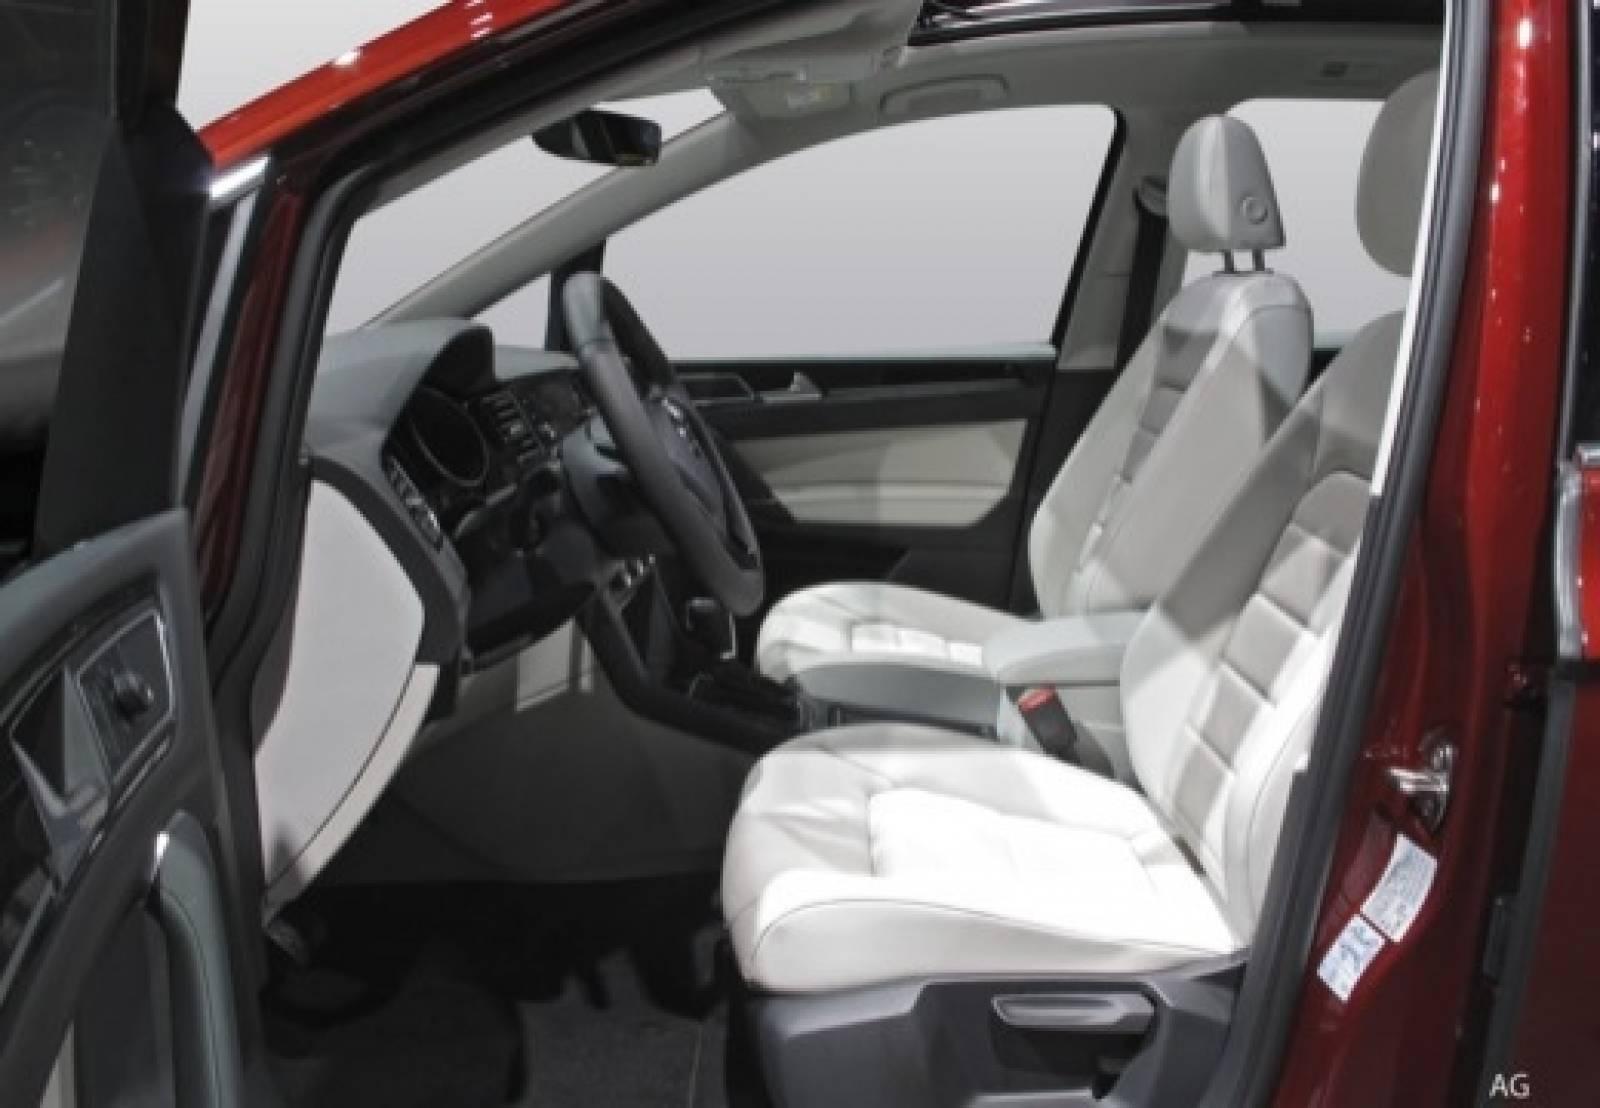 VOLKSWAGEN Golf Sportsvan 1.5 TSI 130 EVO BMT BVM6 - véhicule neuf - LEMAUVIEL AUTOMOBILES - Présentation site web V2 - Lemauviel Automobiles - VIRE - 14500 - VIRE - 6